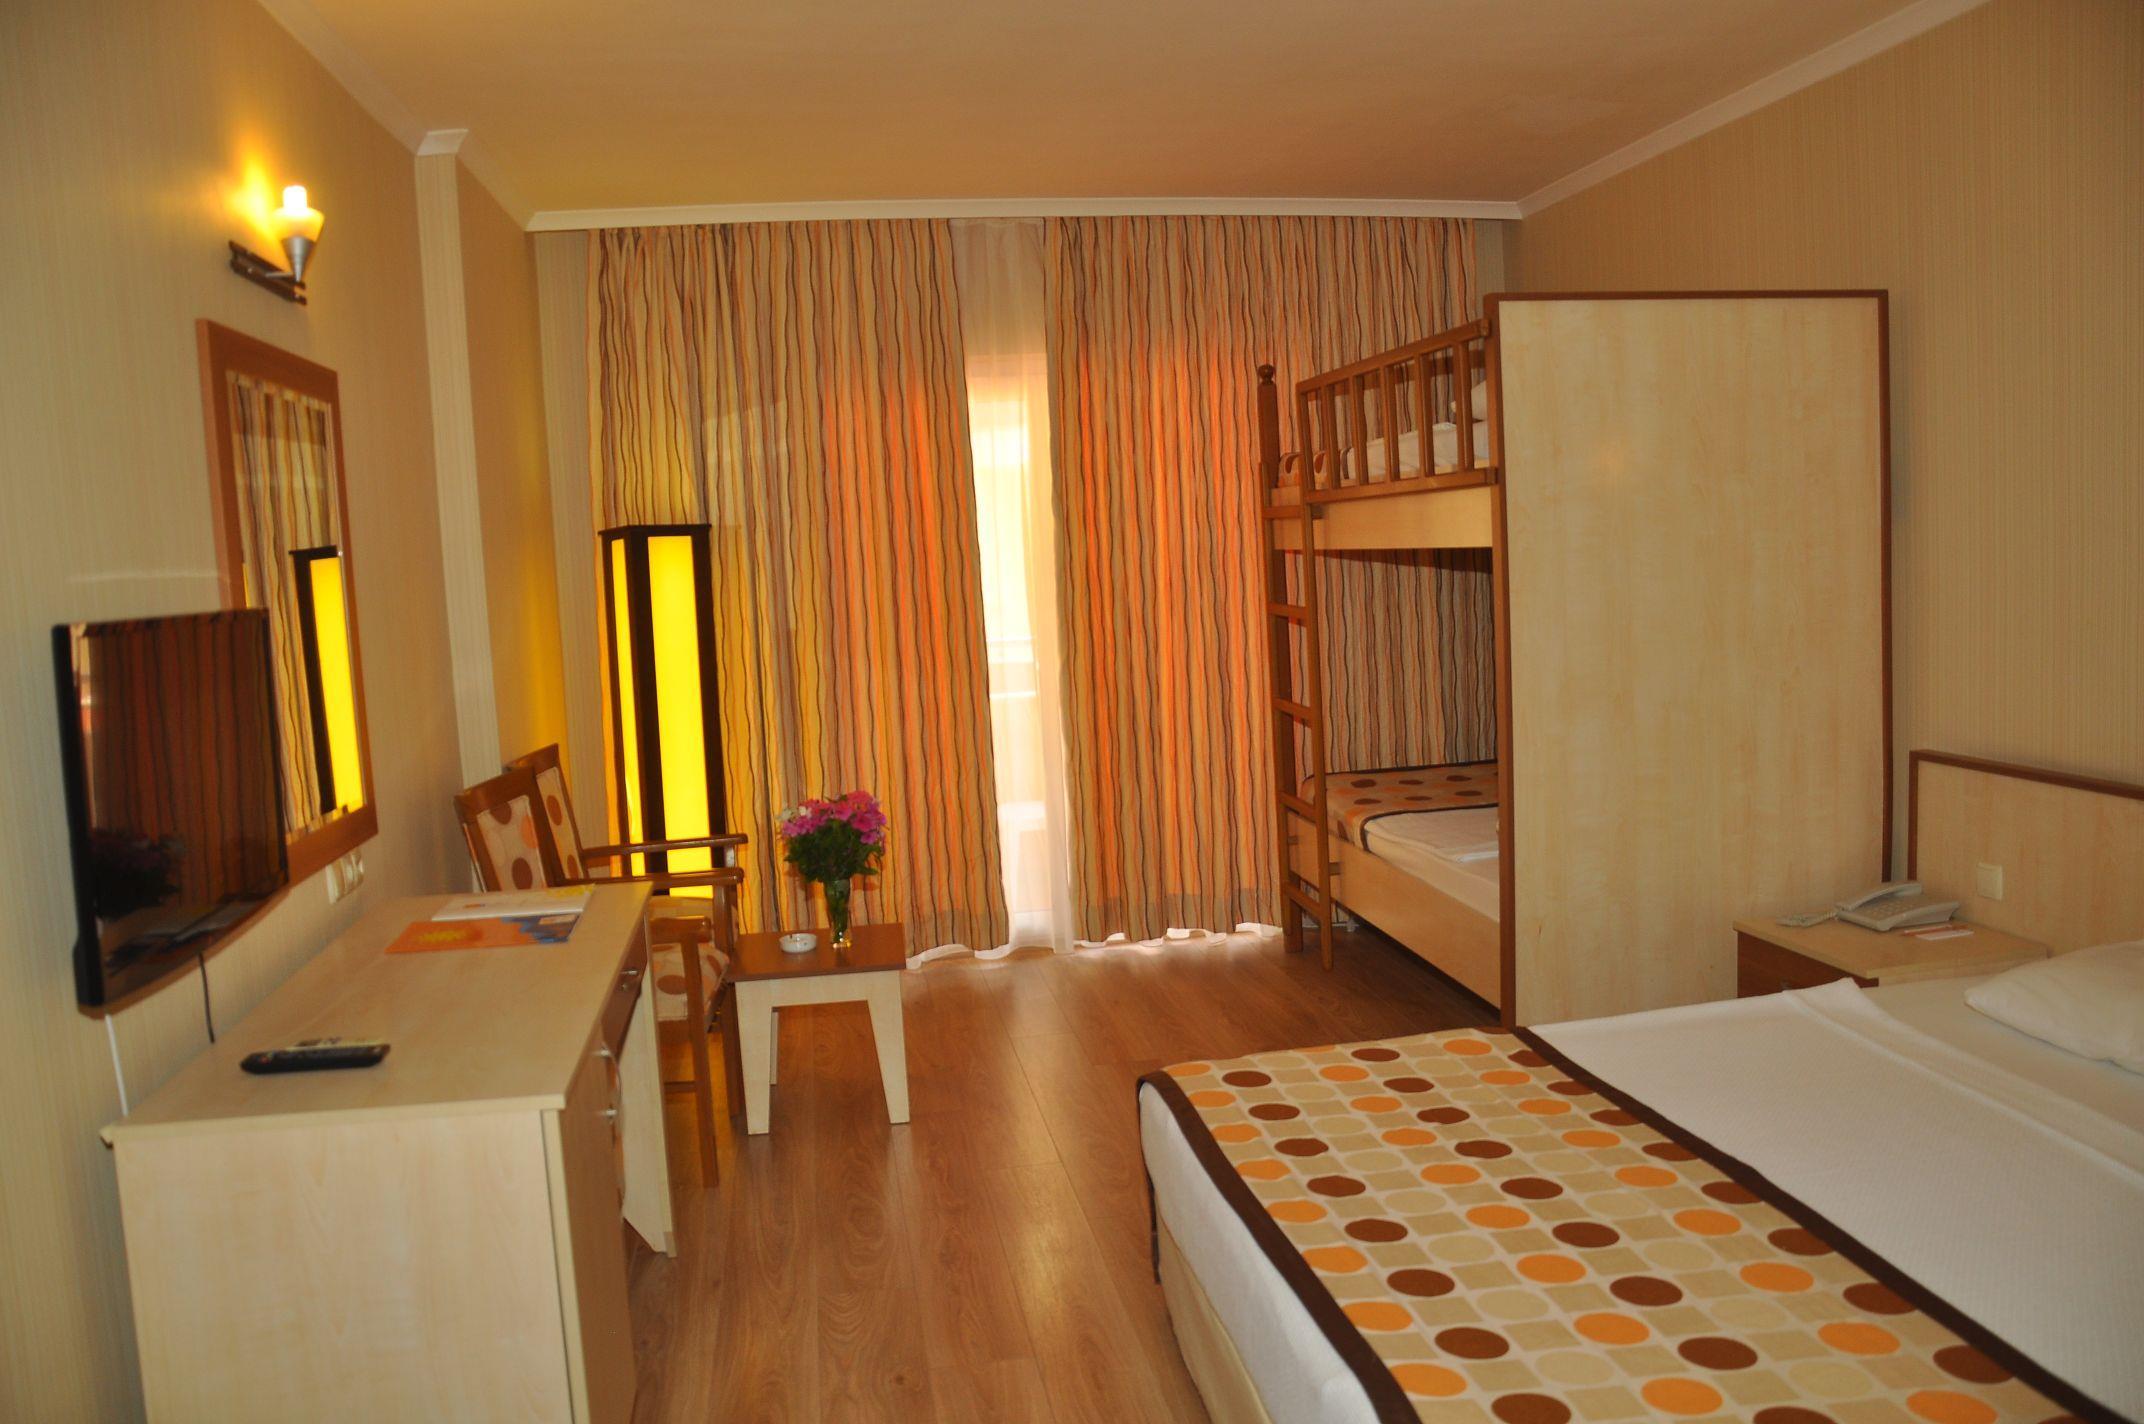 http://www.orextravel.sk/OREX/hotelphotos/stella-beach-hotel-alanya-general-008.jpg